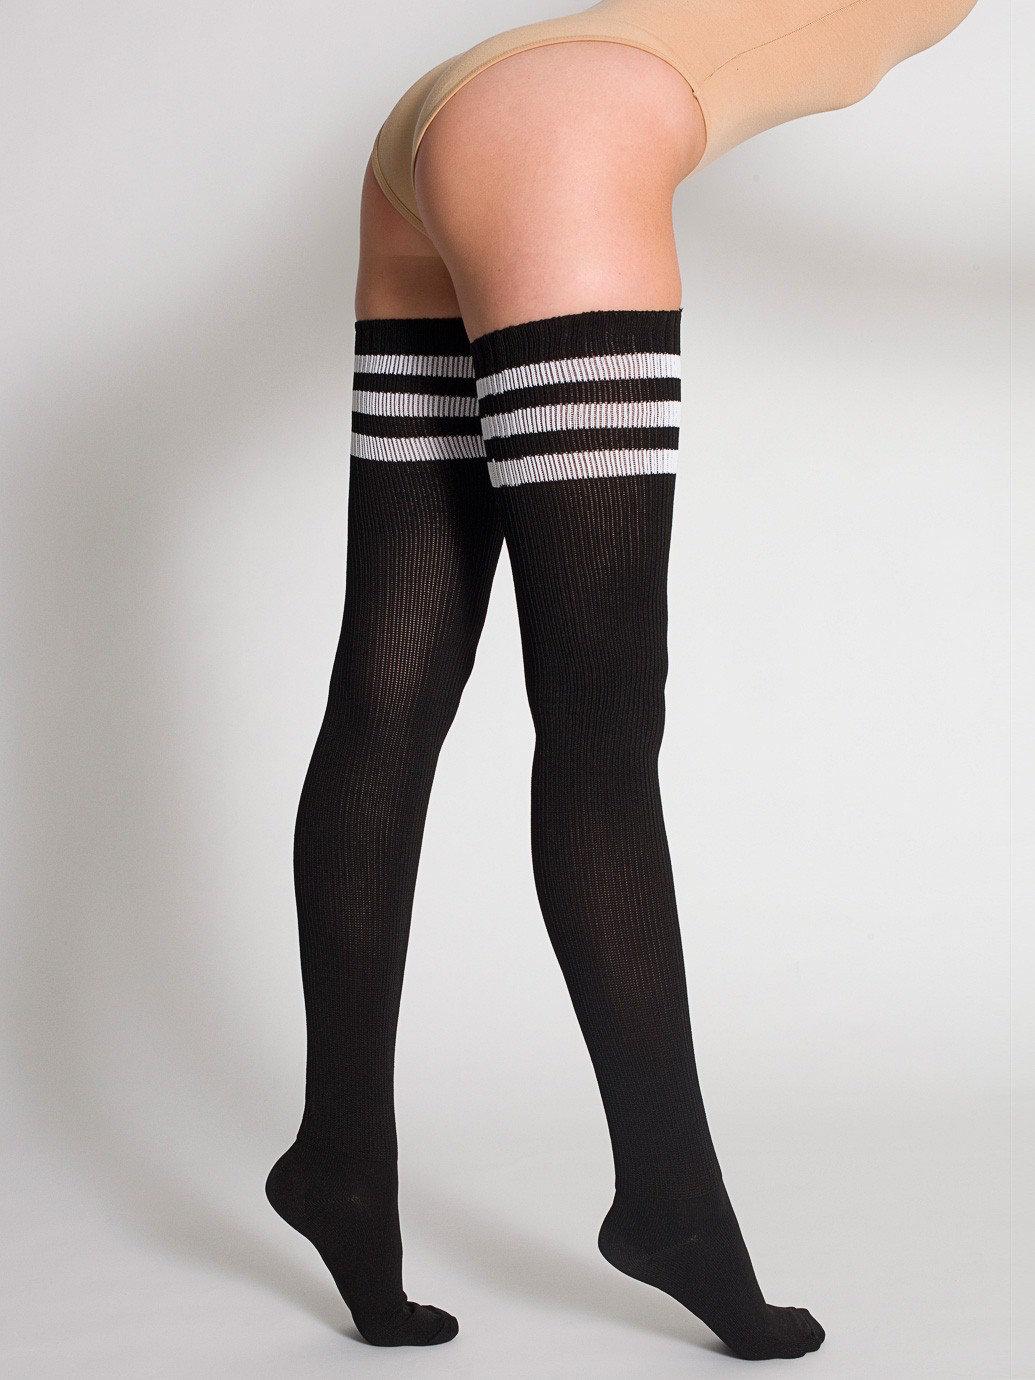 Striped Thigh High Stockings, White & Red Joy of Socks